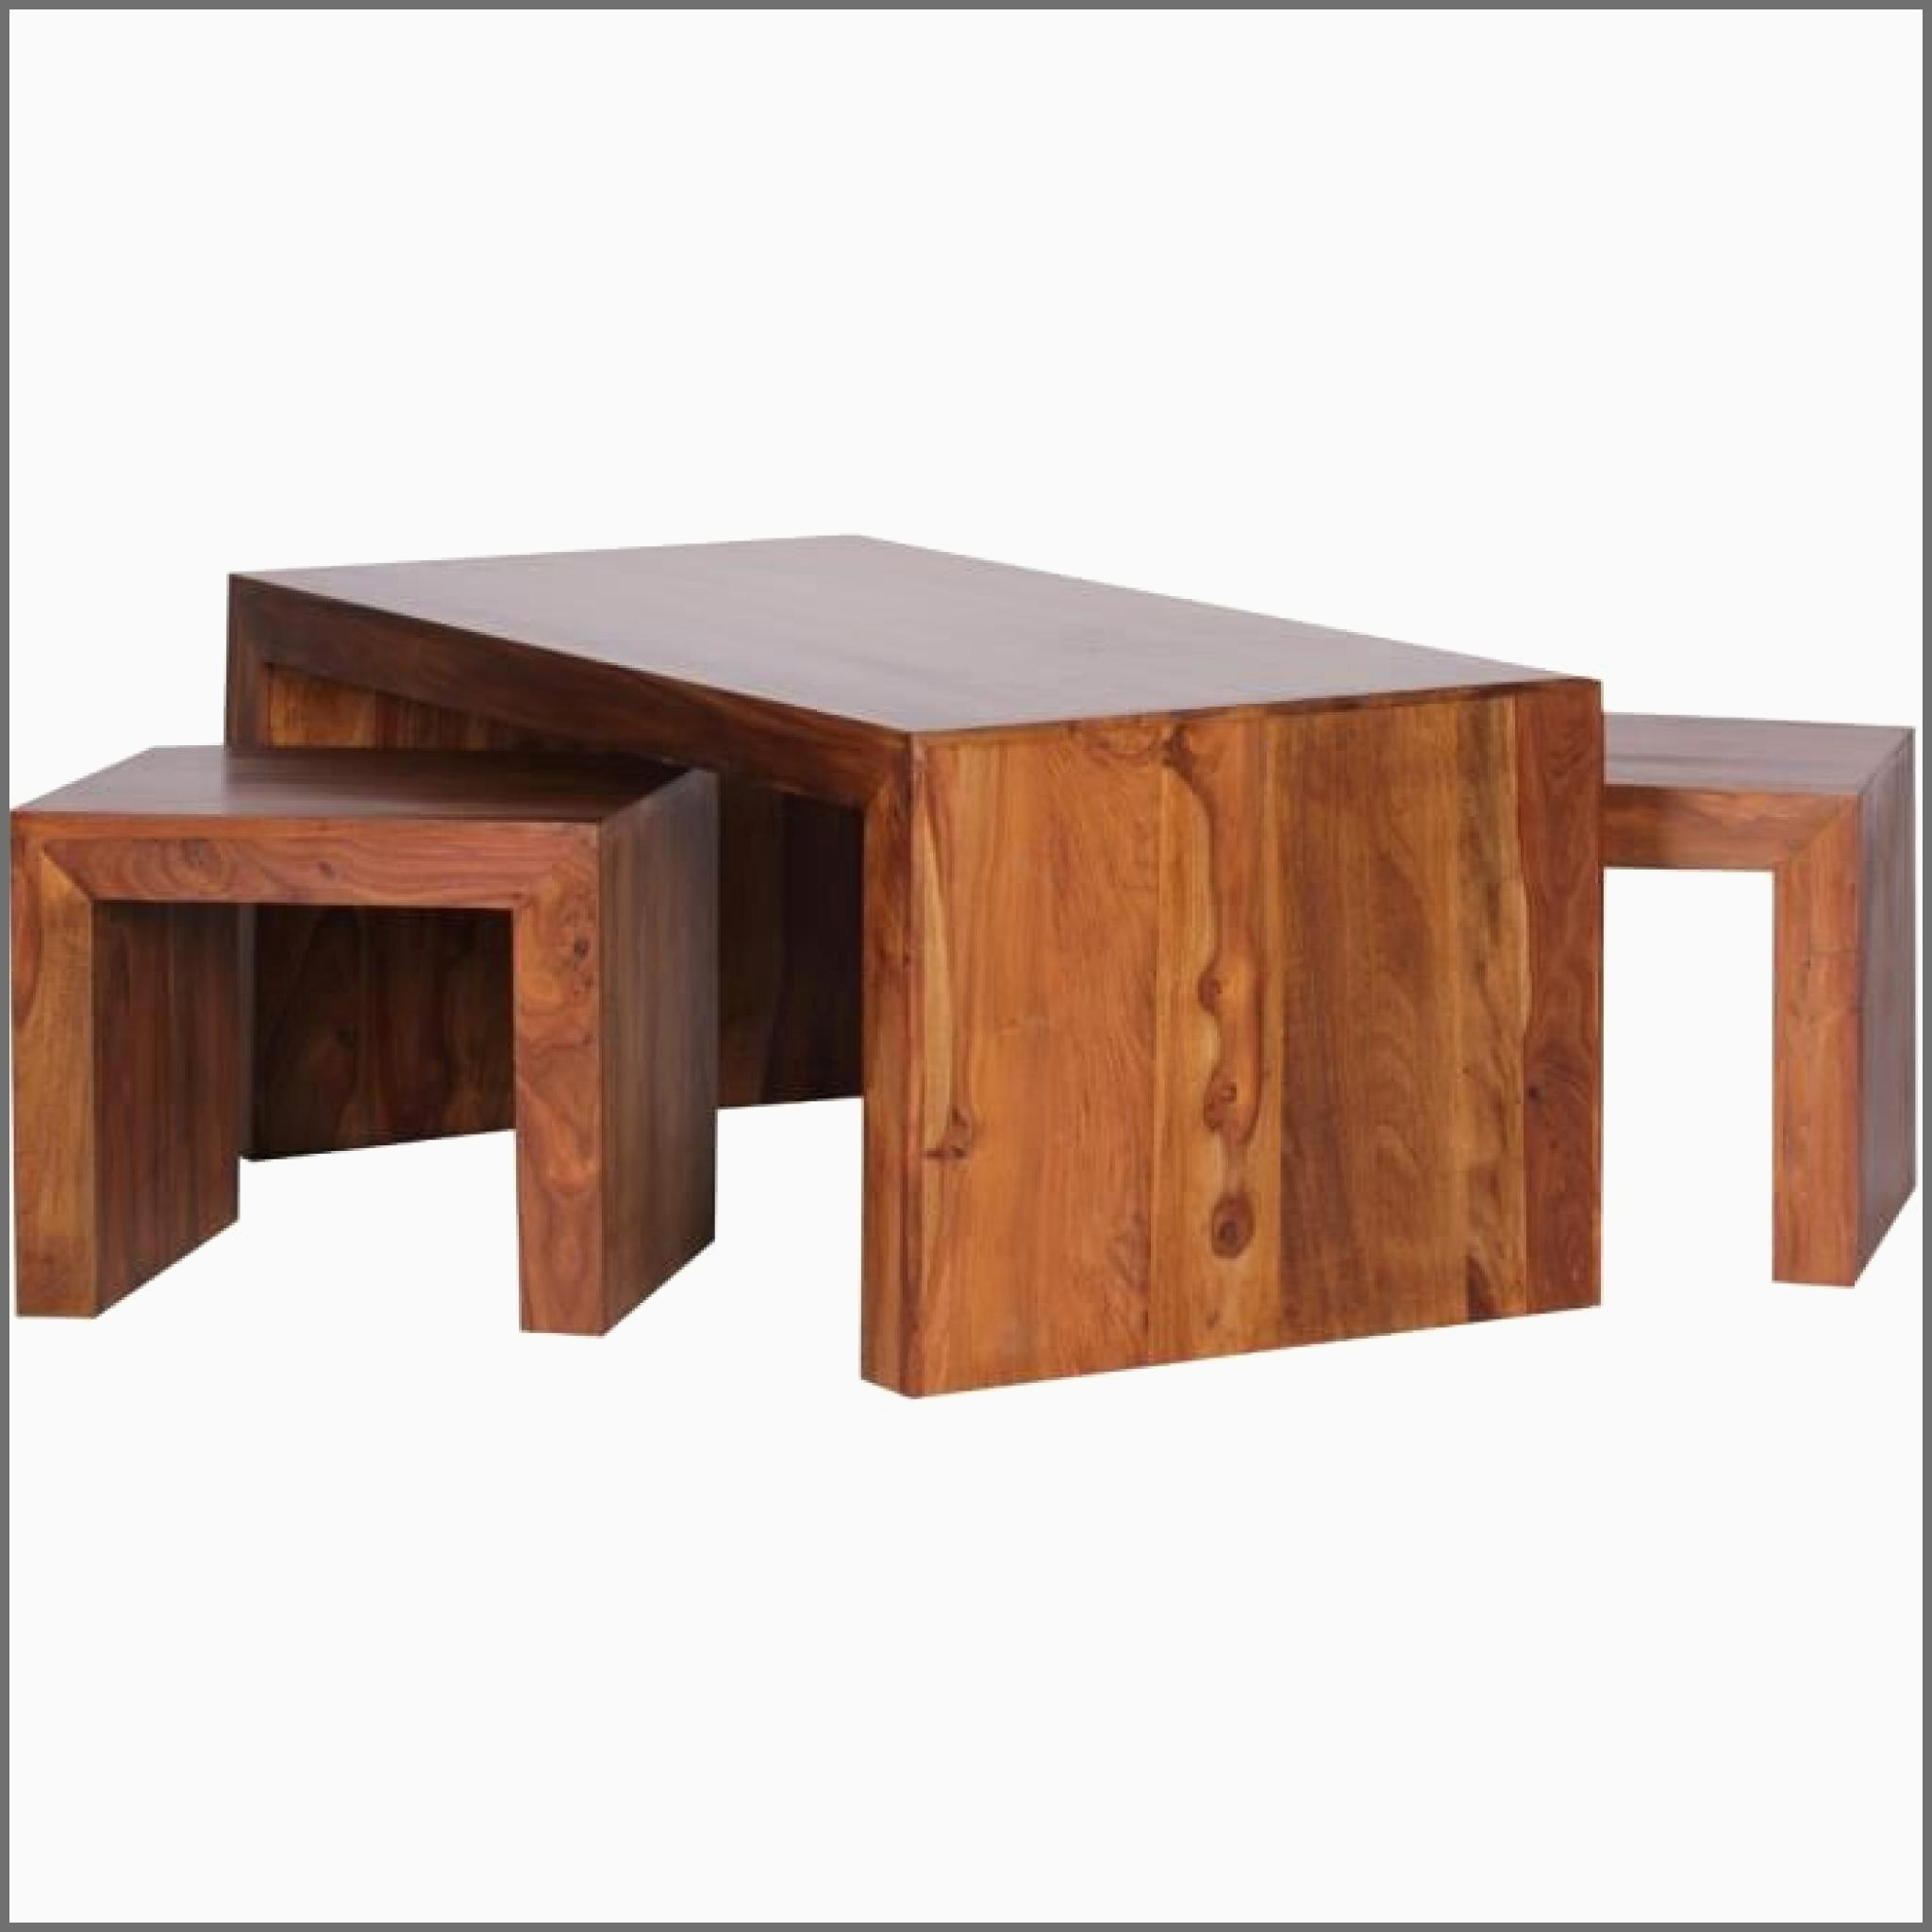 Table basse bois avec tabouret